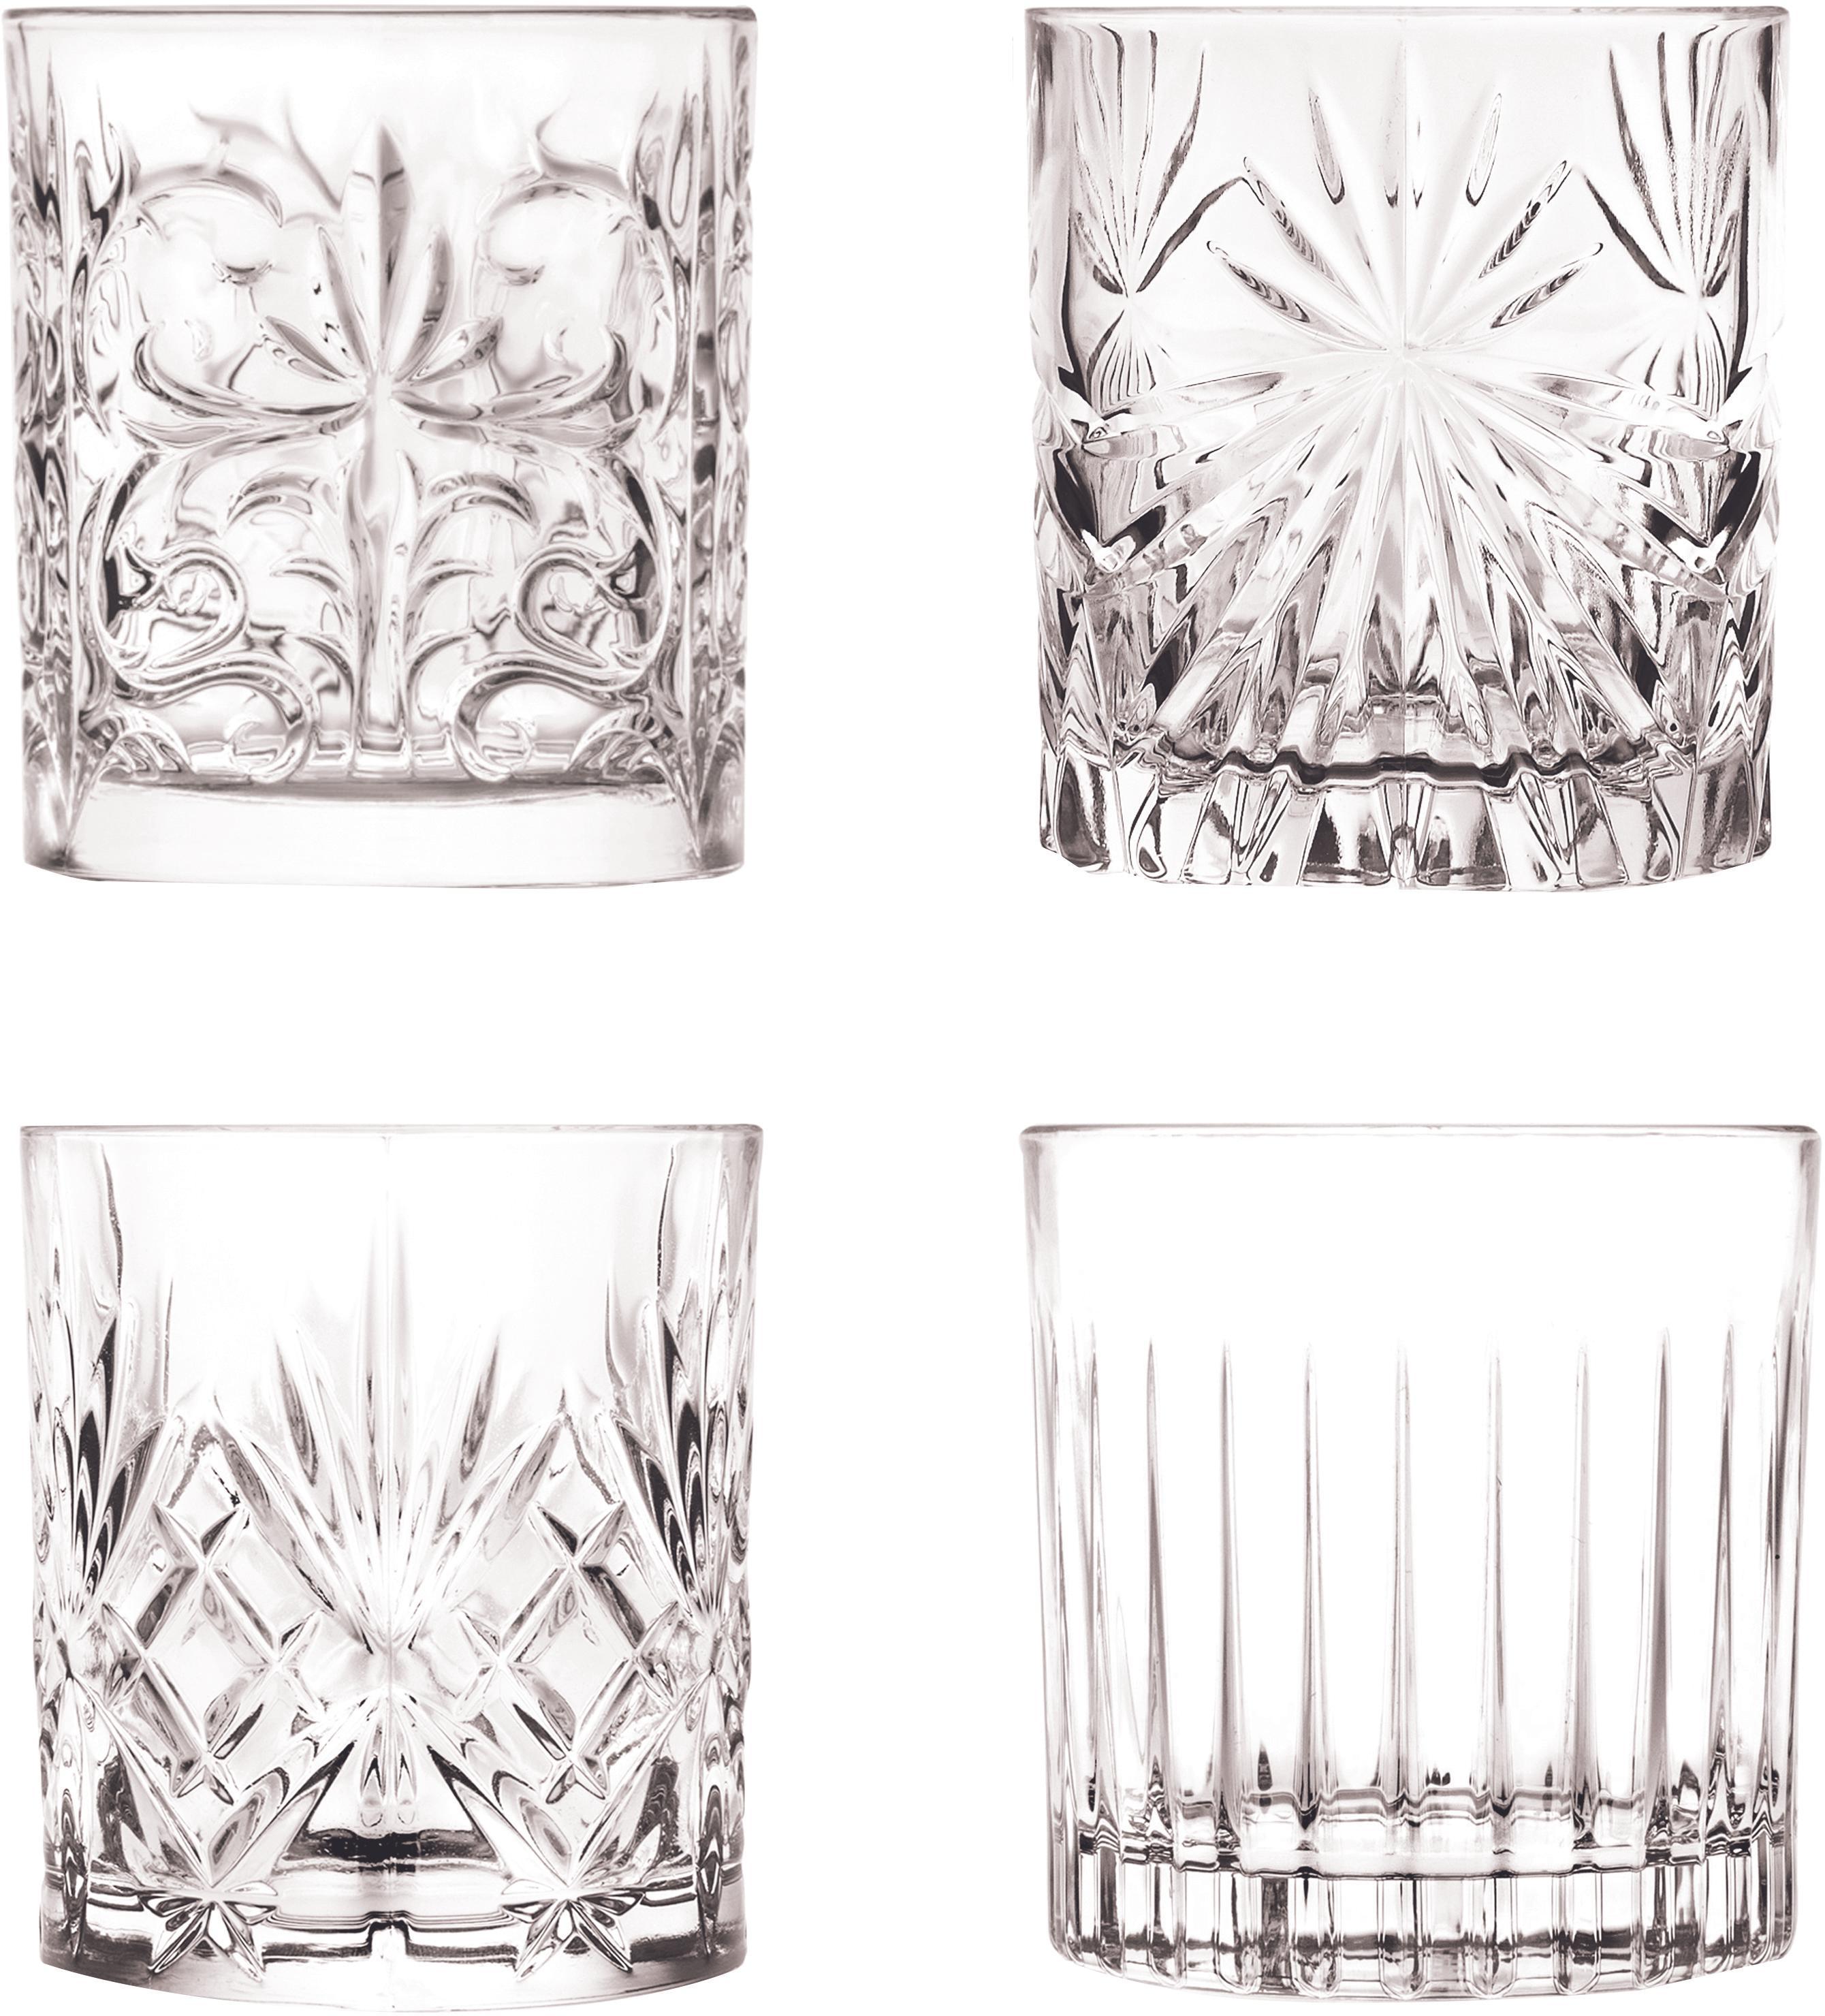 Vasos old fashioned de cristal Bichiera, 4uds., Cristal, Transparente, Ø 8 x Al 9 cm